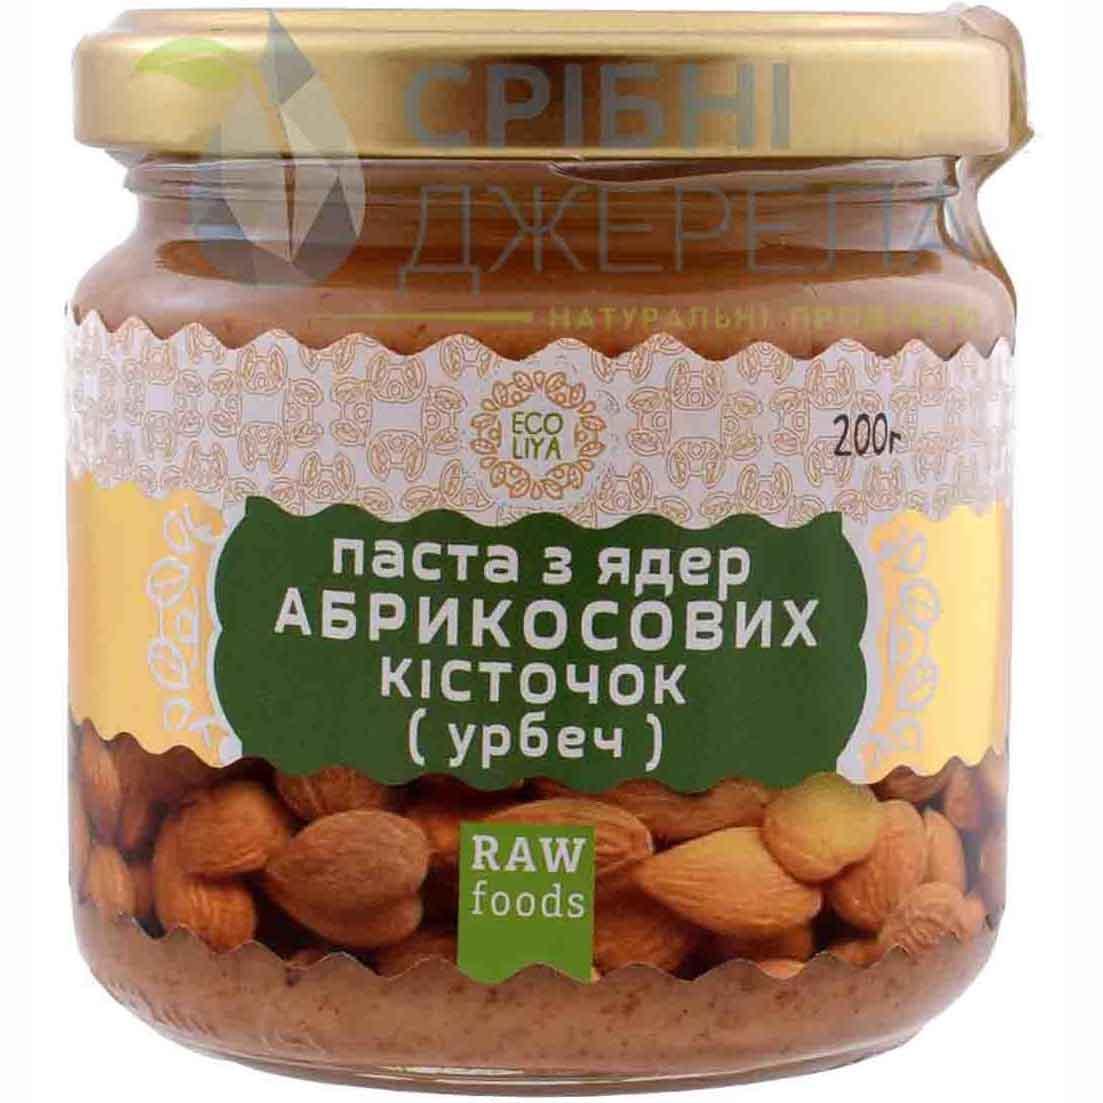 Абрикосовая паста (Урбеч), 200 г